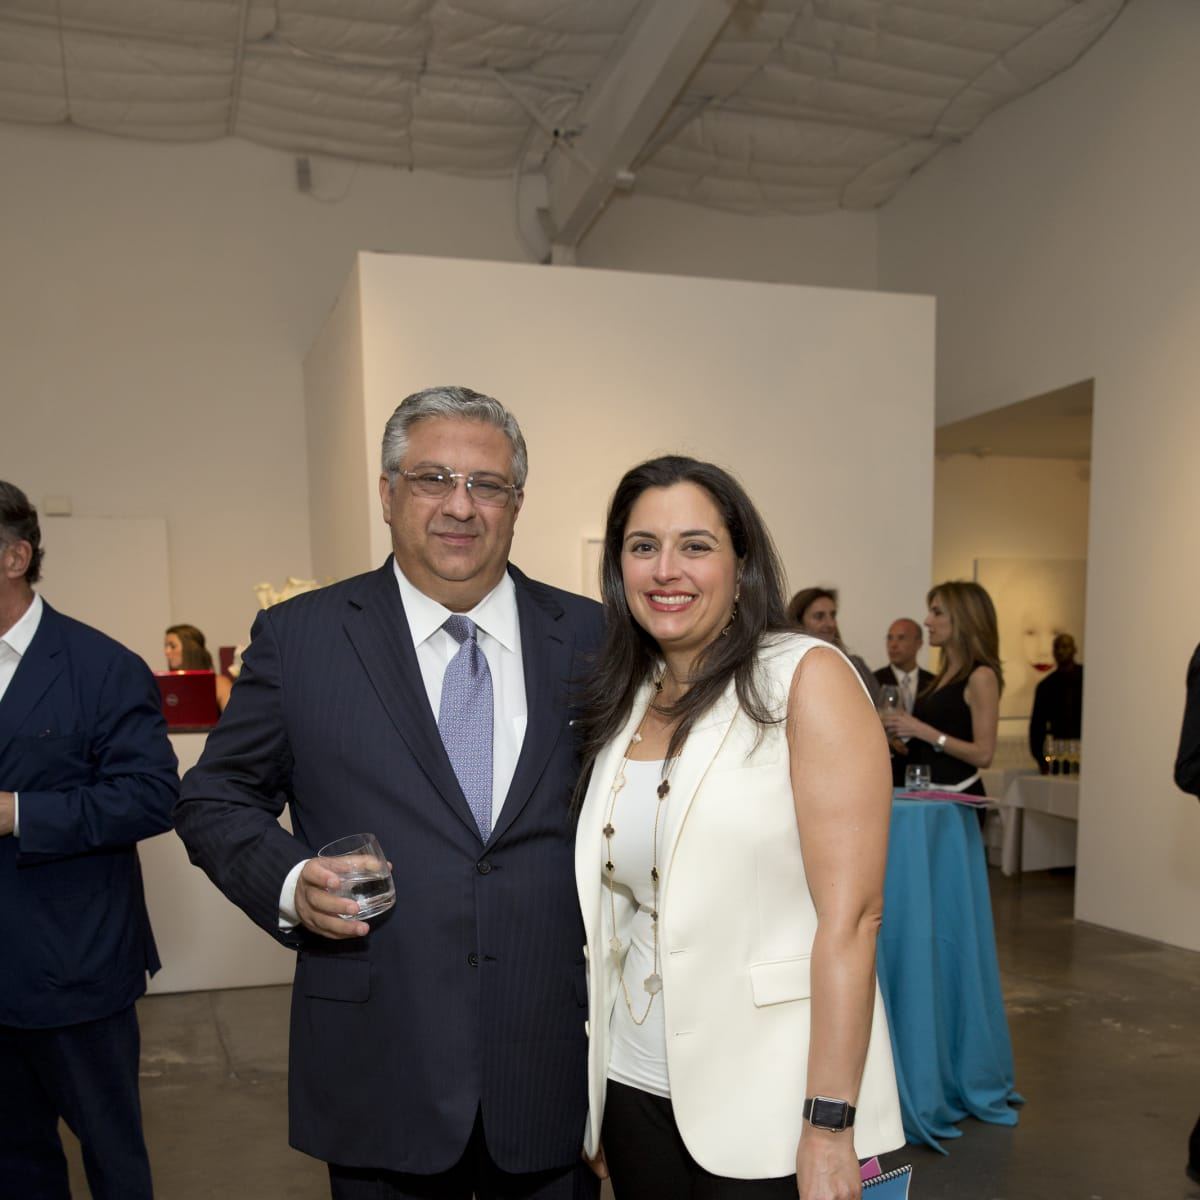 UNICEF Art Auction, 5/16  Nijad Fares, Zeina Fares